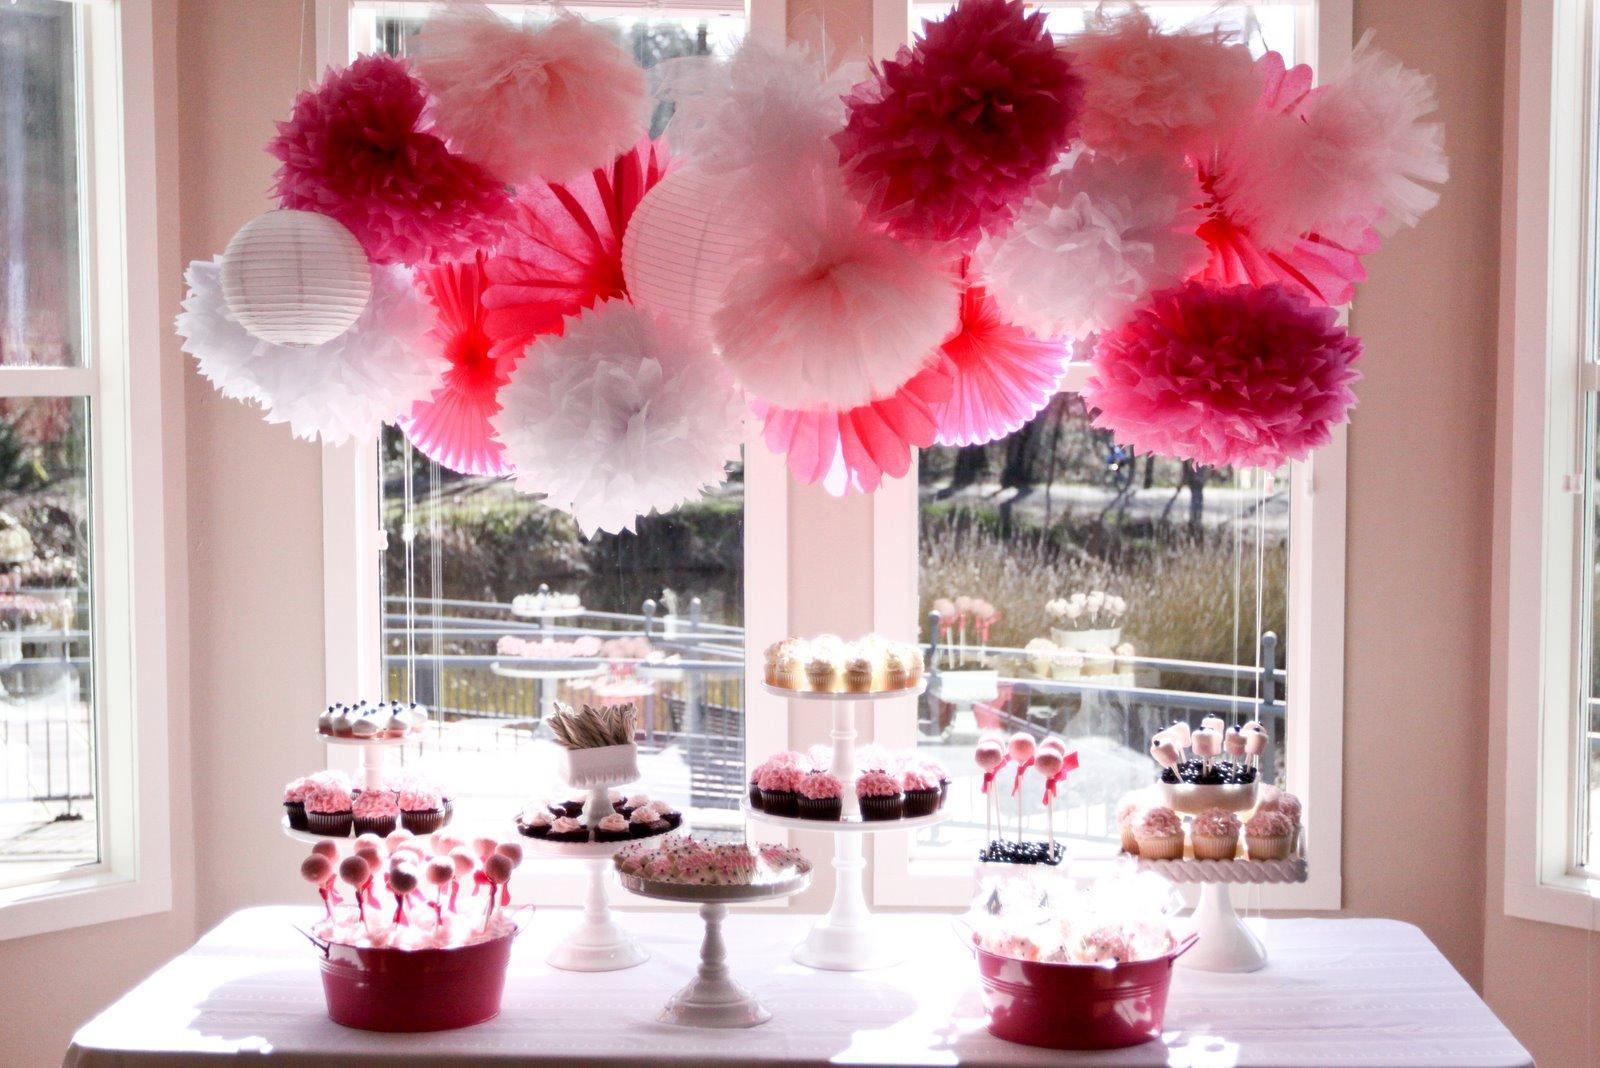 Table Decorations: Brenda's Bridal Shower